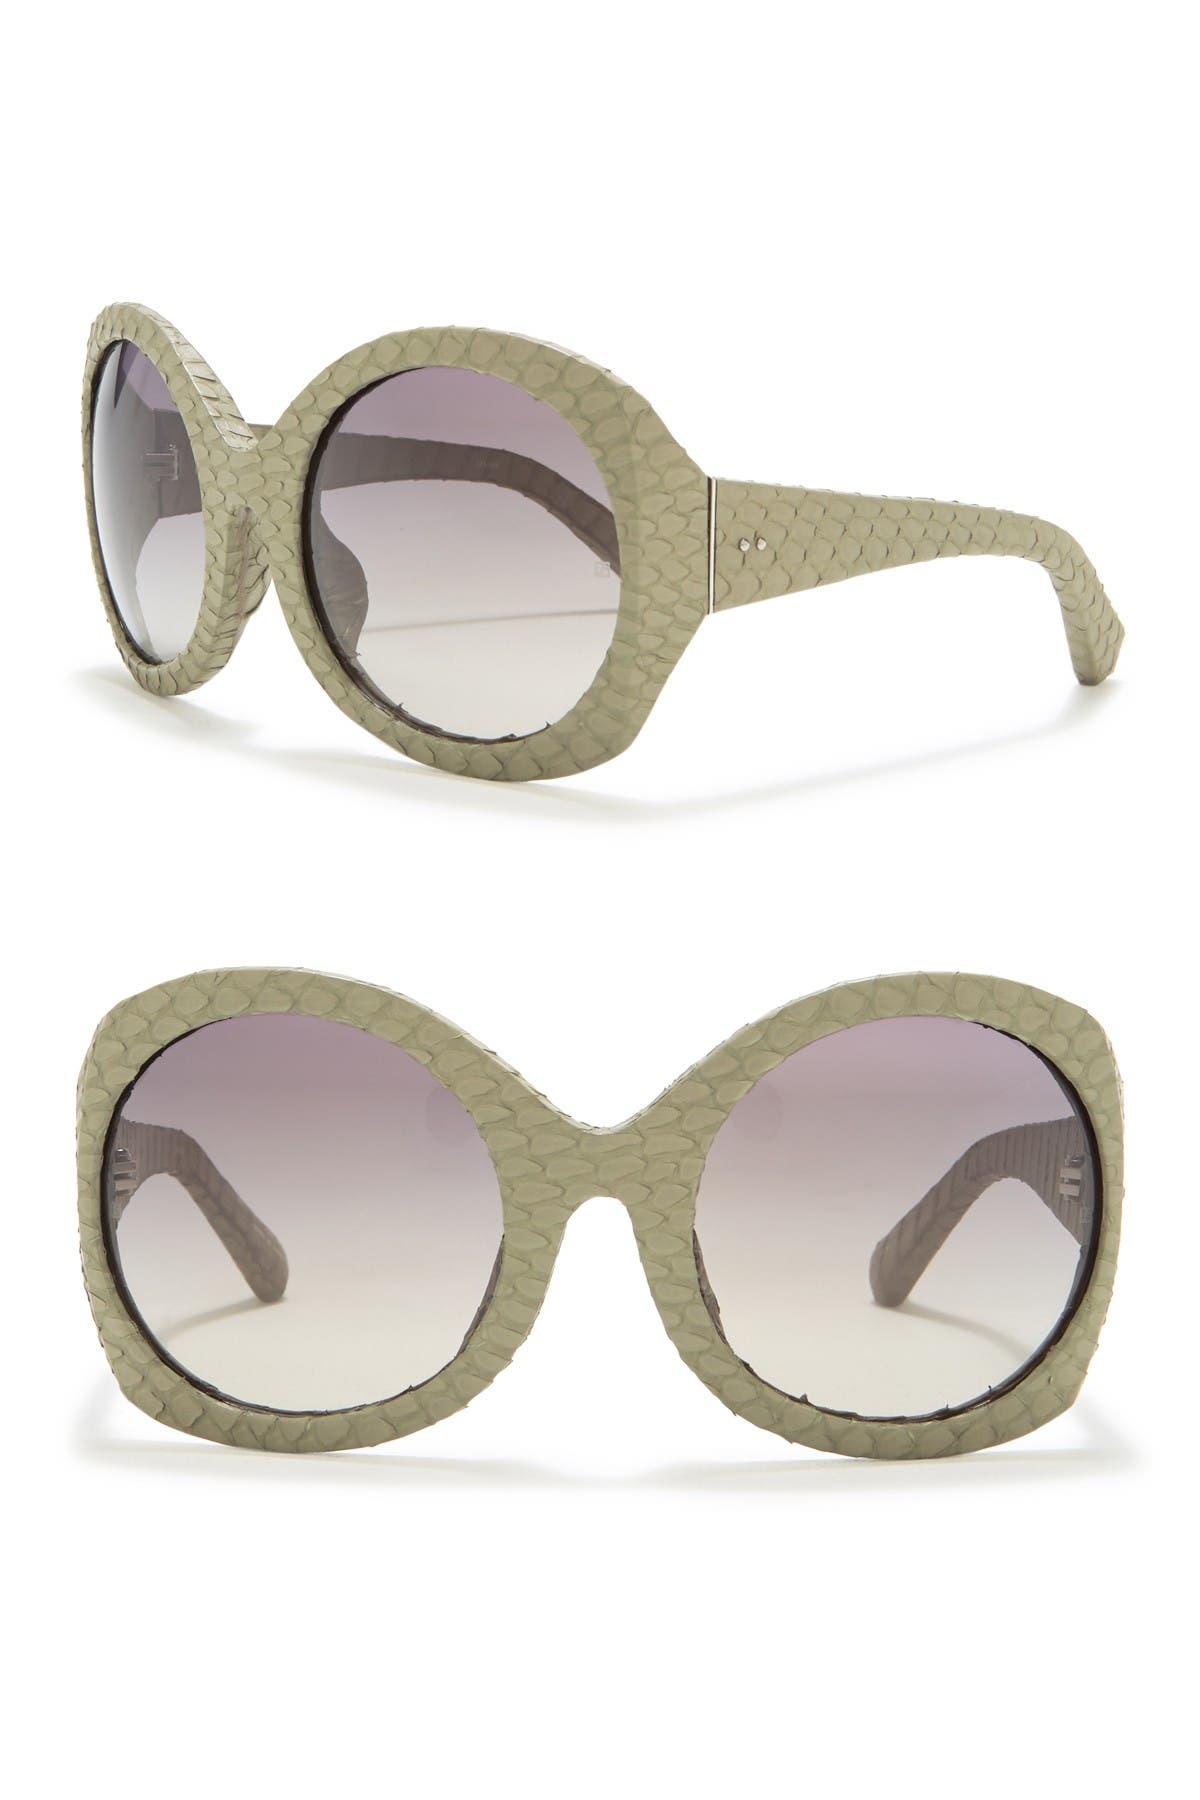 Image of Linda Farrow Oversize Round Sunglasses